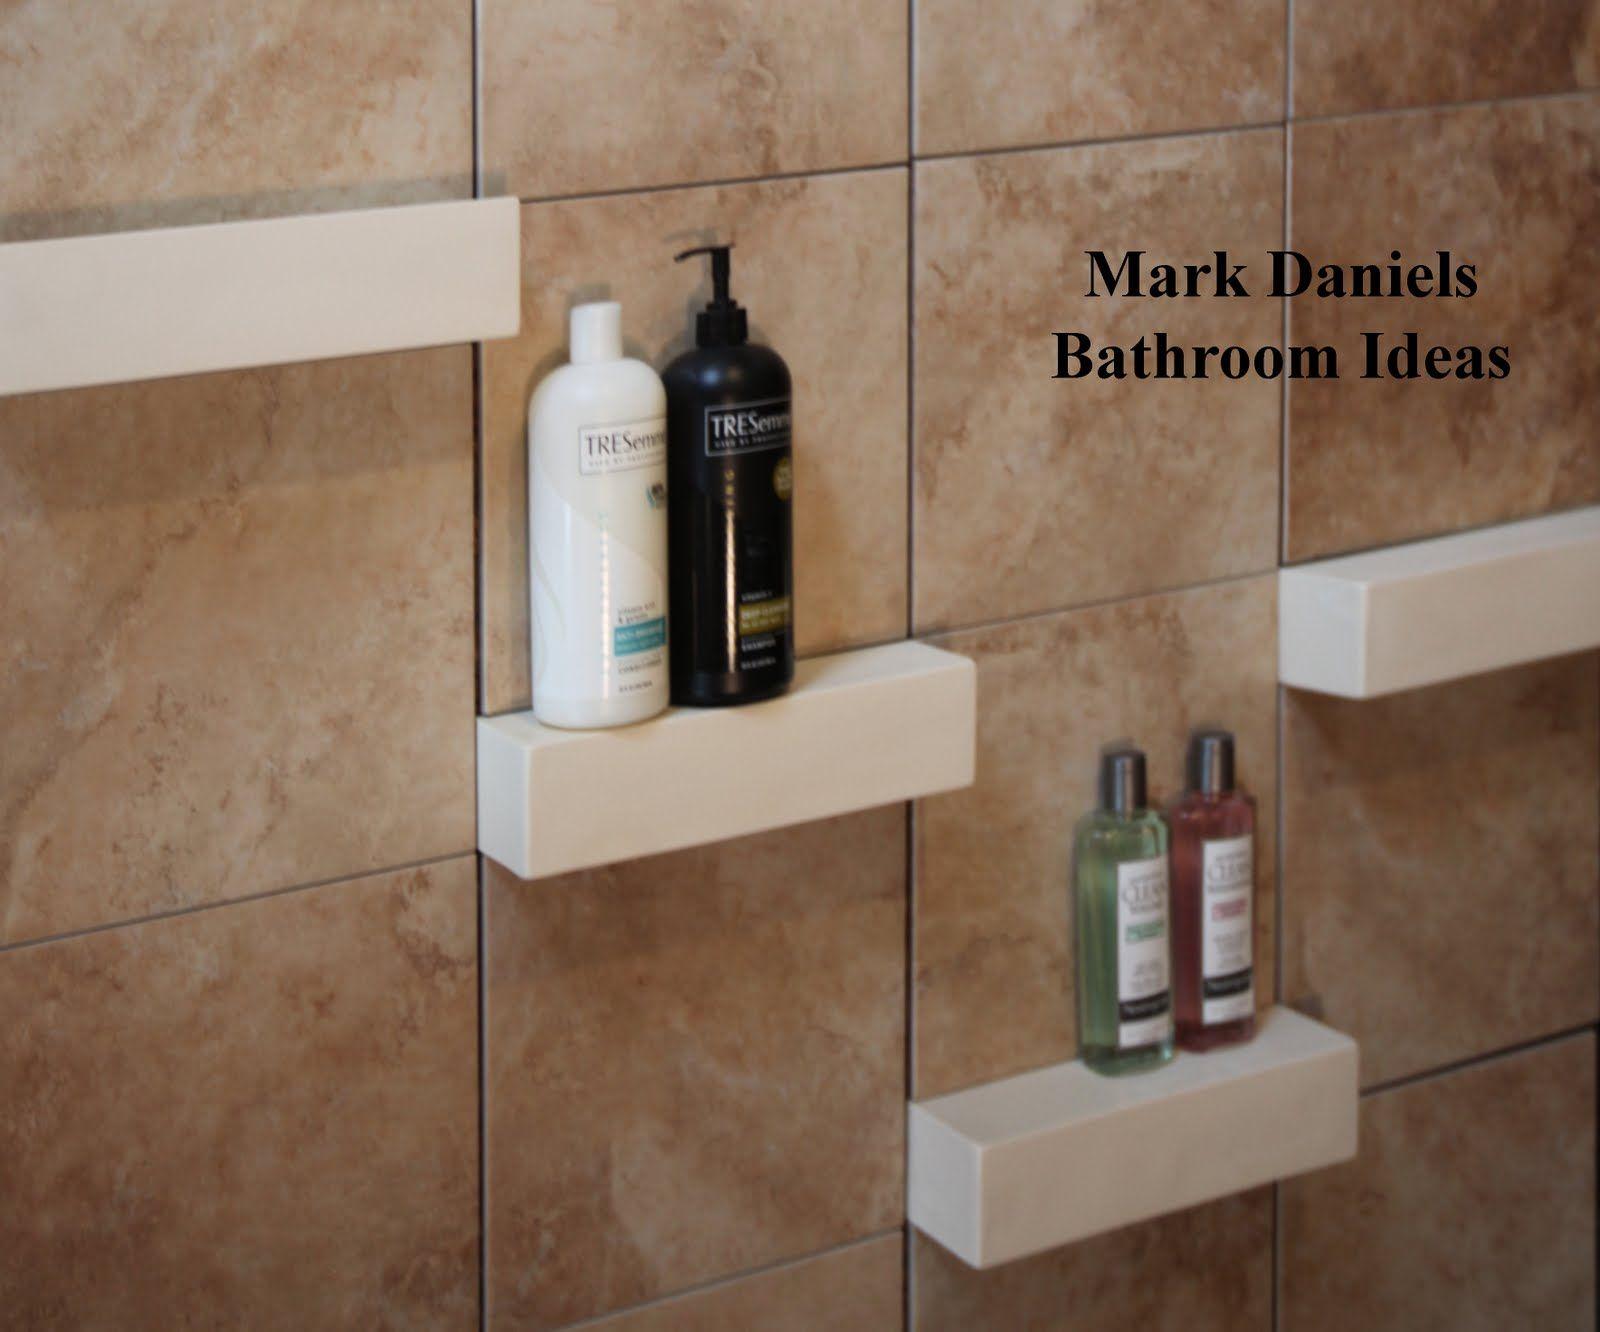 Bathroom Niche Decor : Bathroom remodeling design ideas tile shower niches